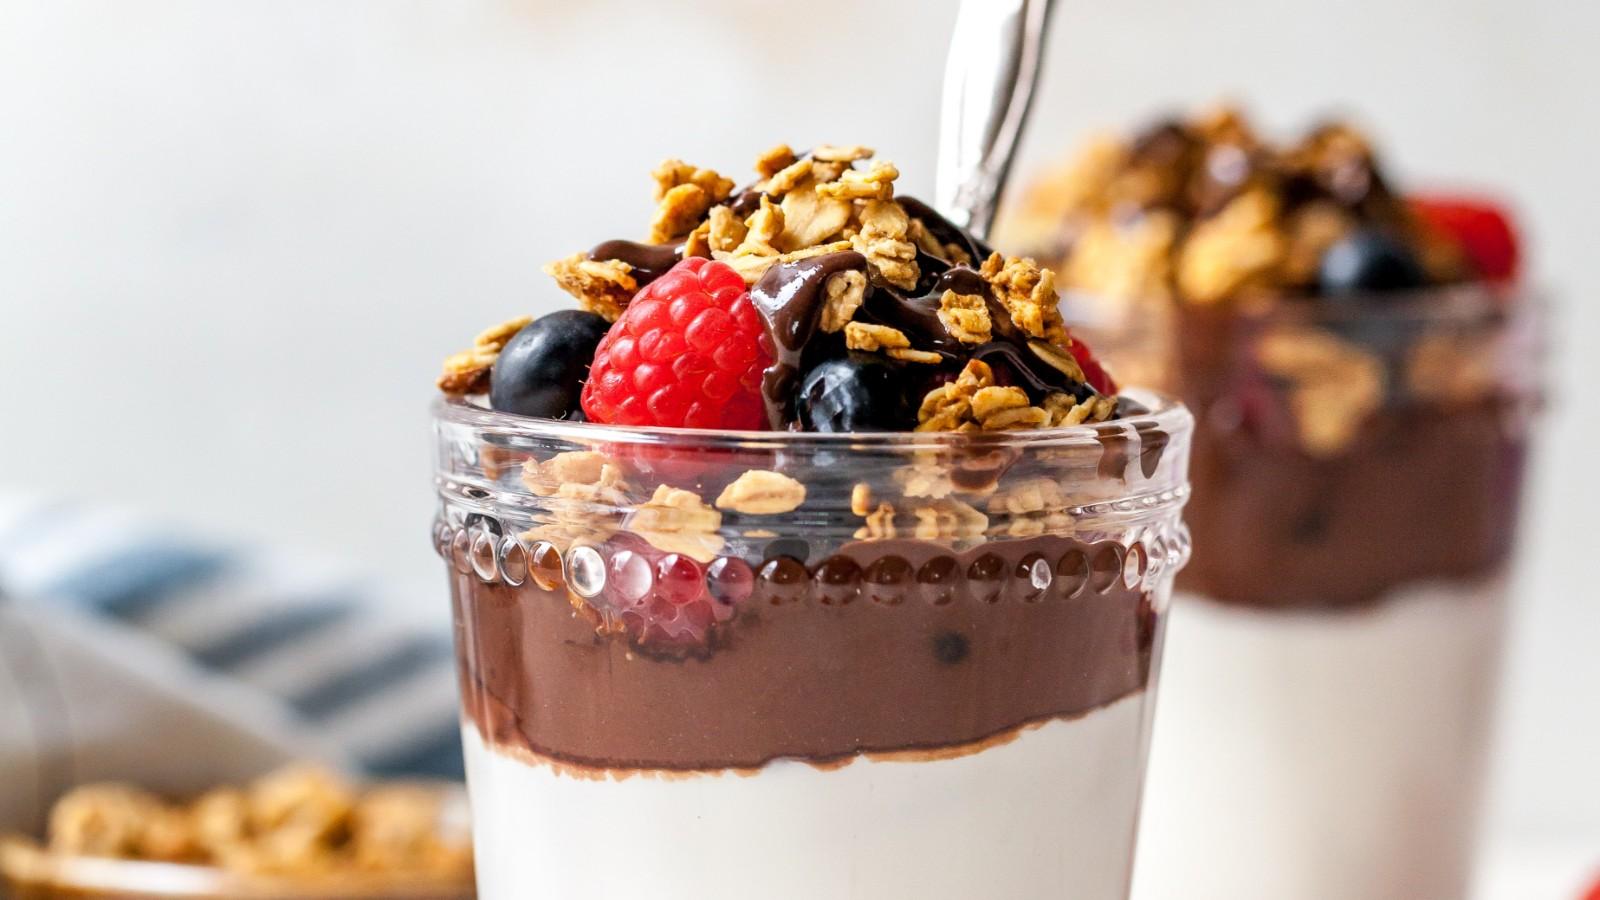 Image of Chocolate Tahini Yogurt Parfait